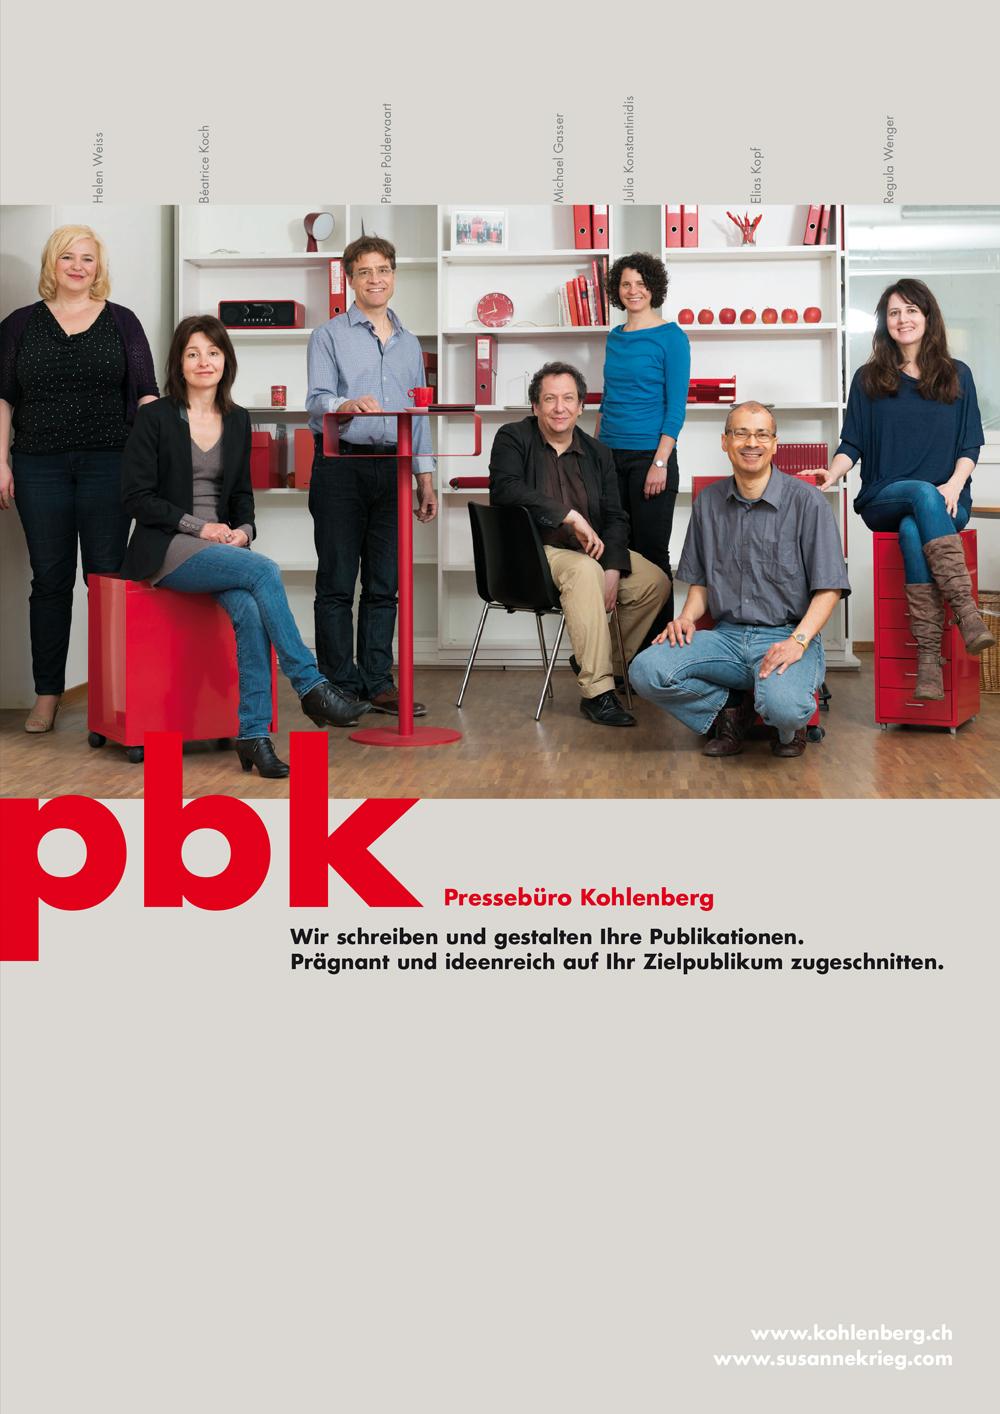 Pressebüro Kohlenberg Folder